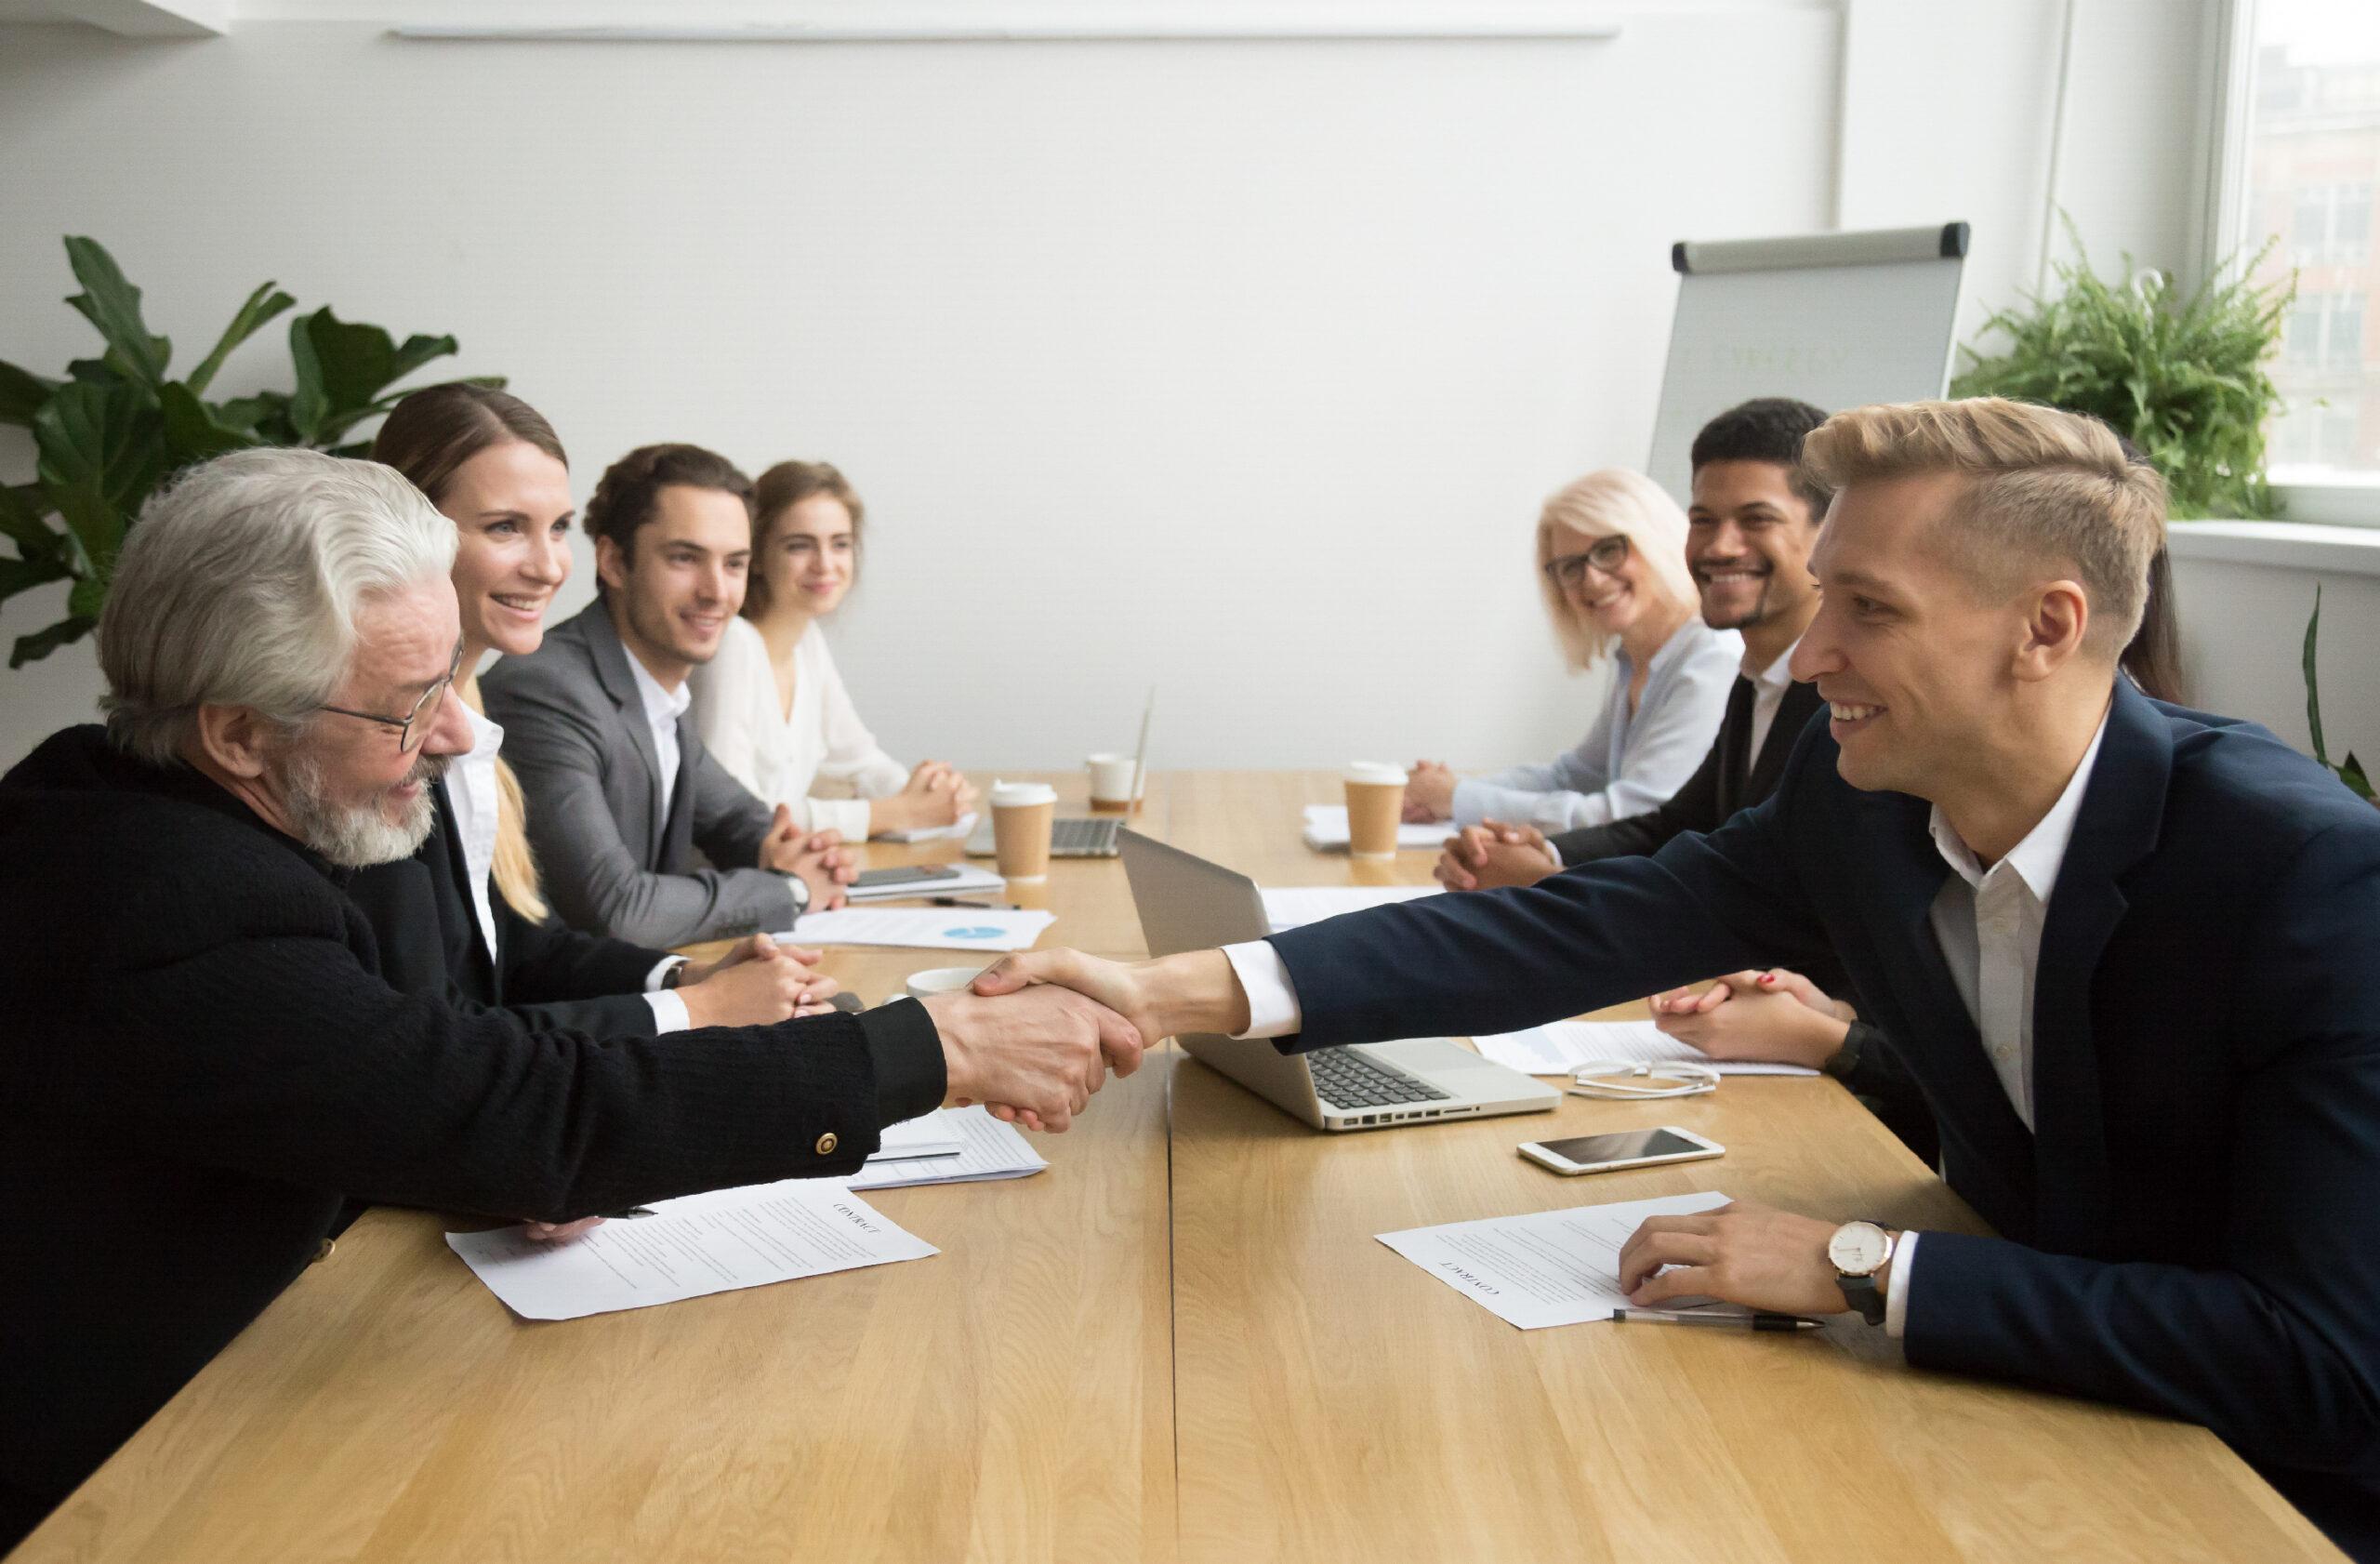 Businessmen Services | خدمات رجال الأعمال